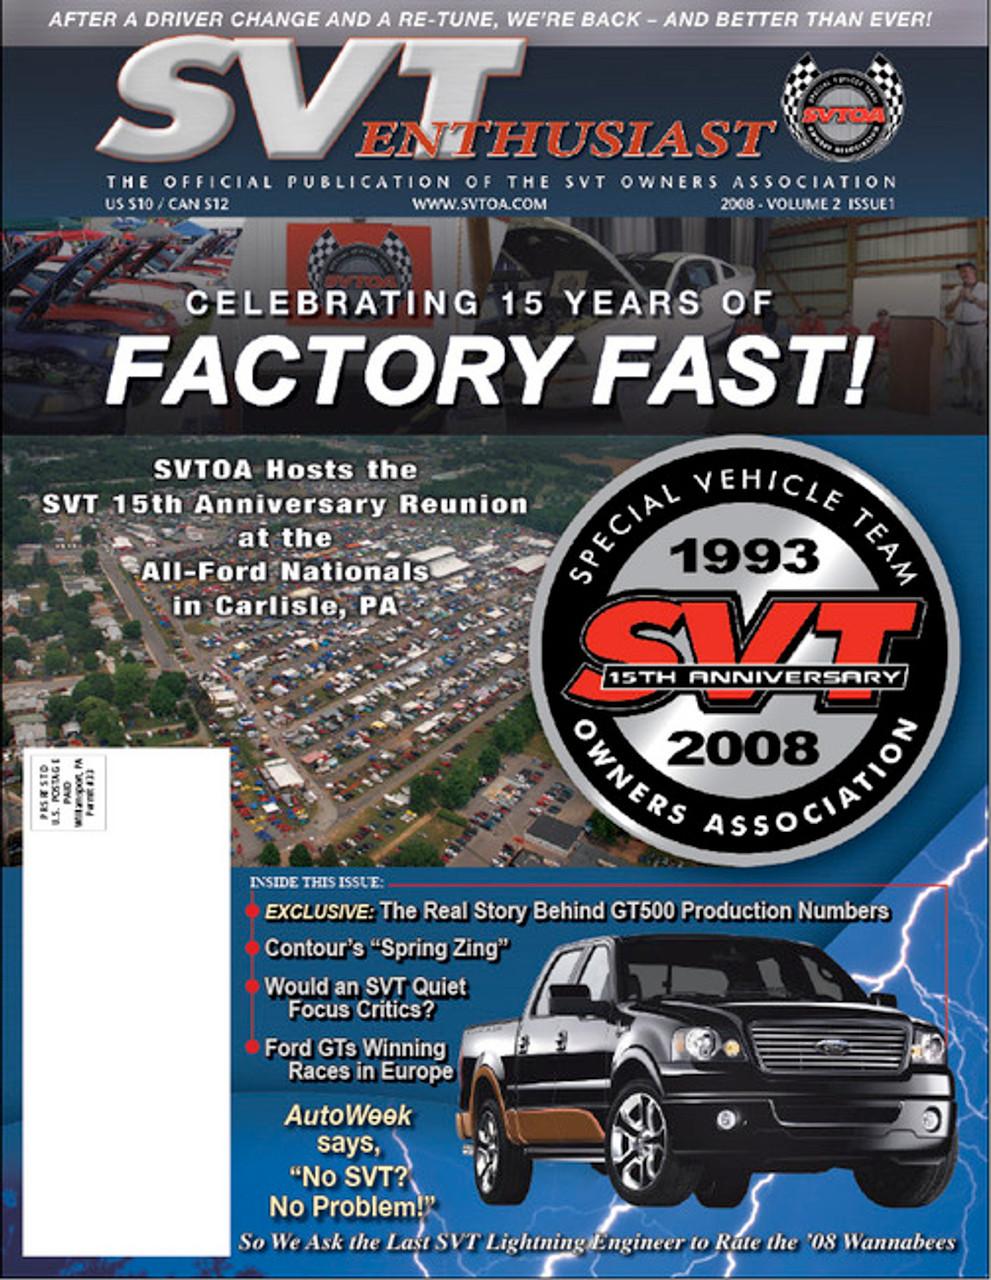 SVT Enthusiast Magazine Vol 2 Issue 1 - 2008